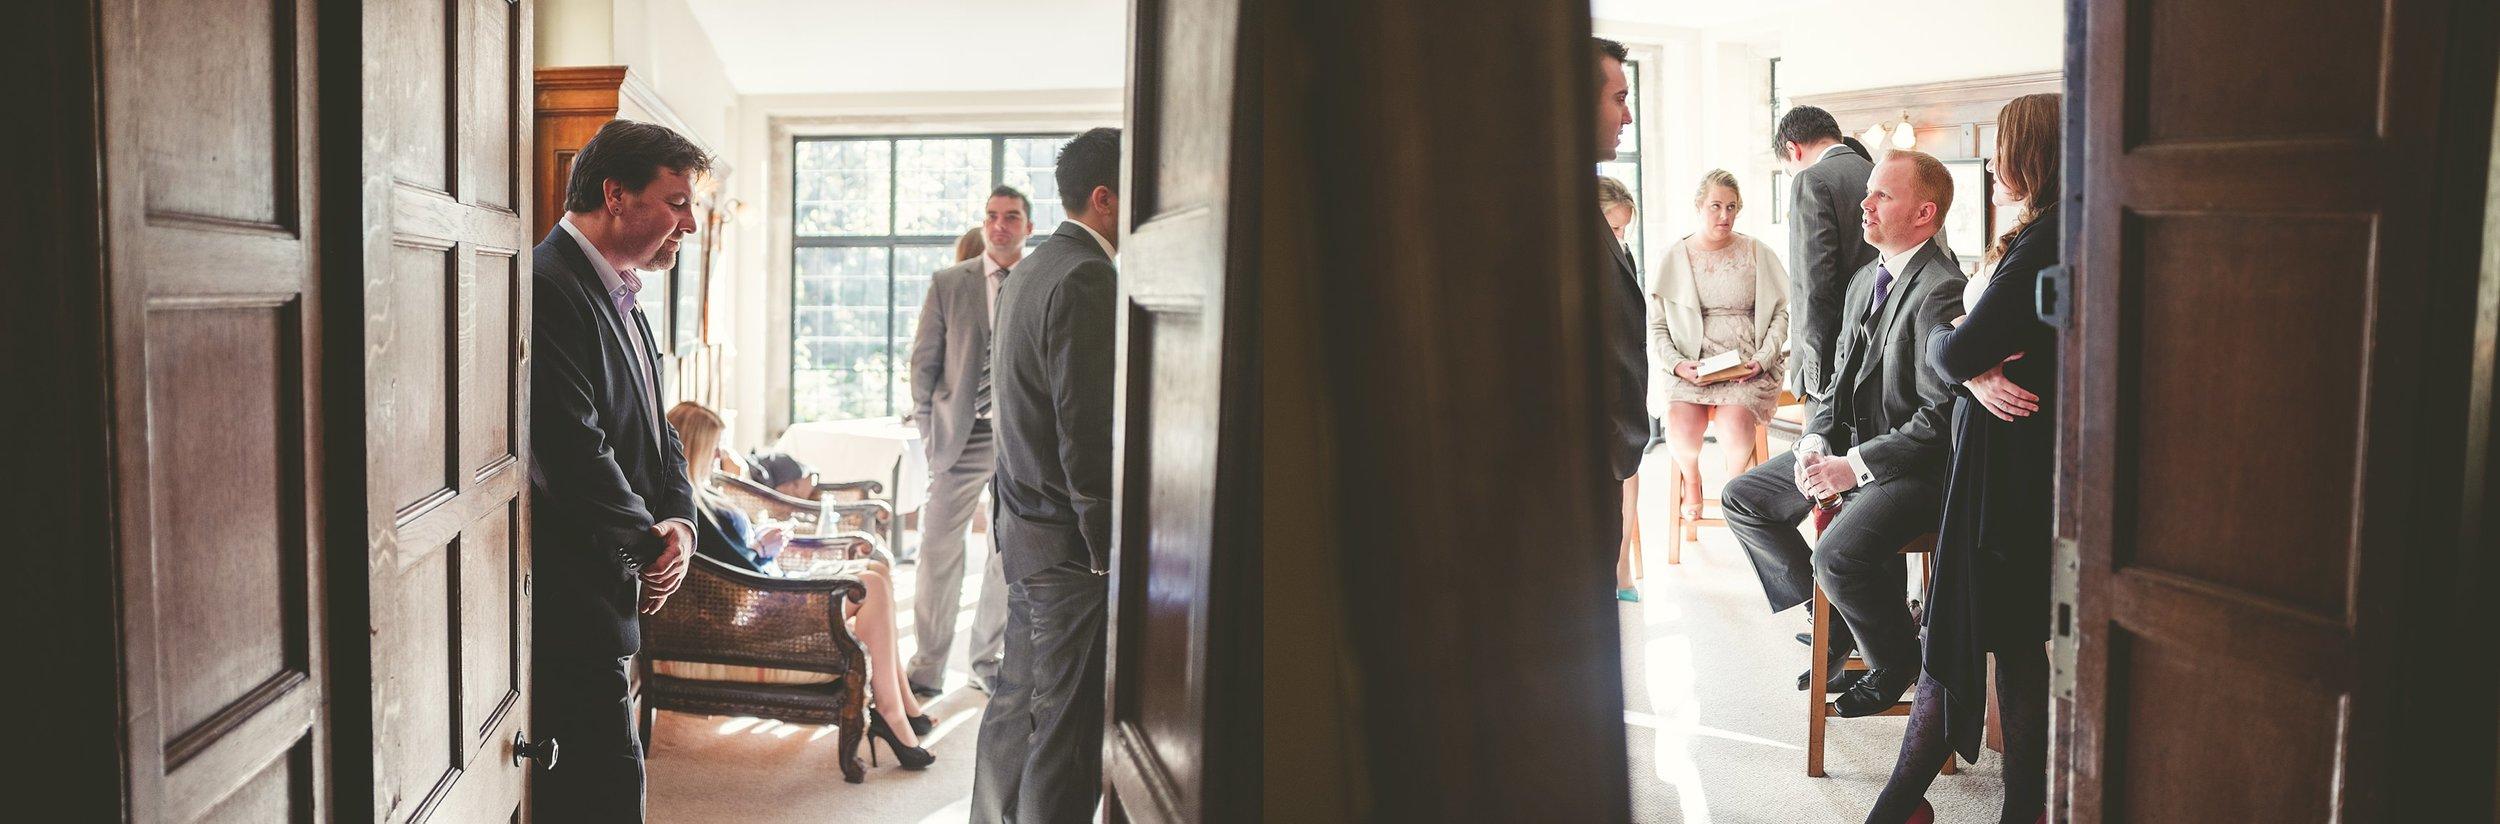 priory bay wedding_0026.jpg